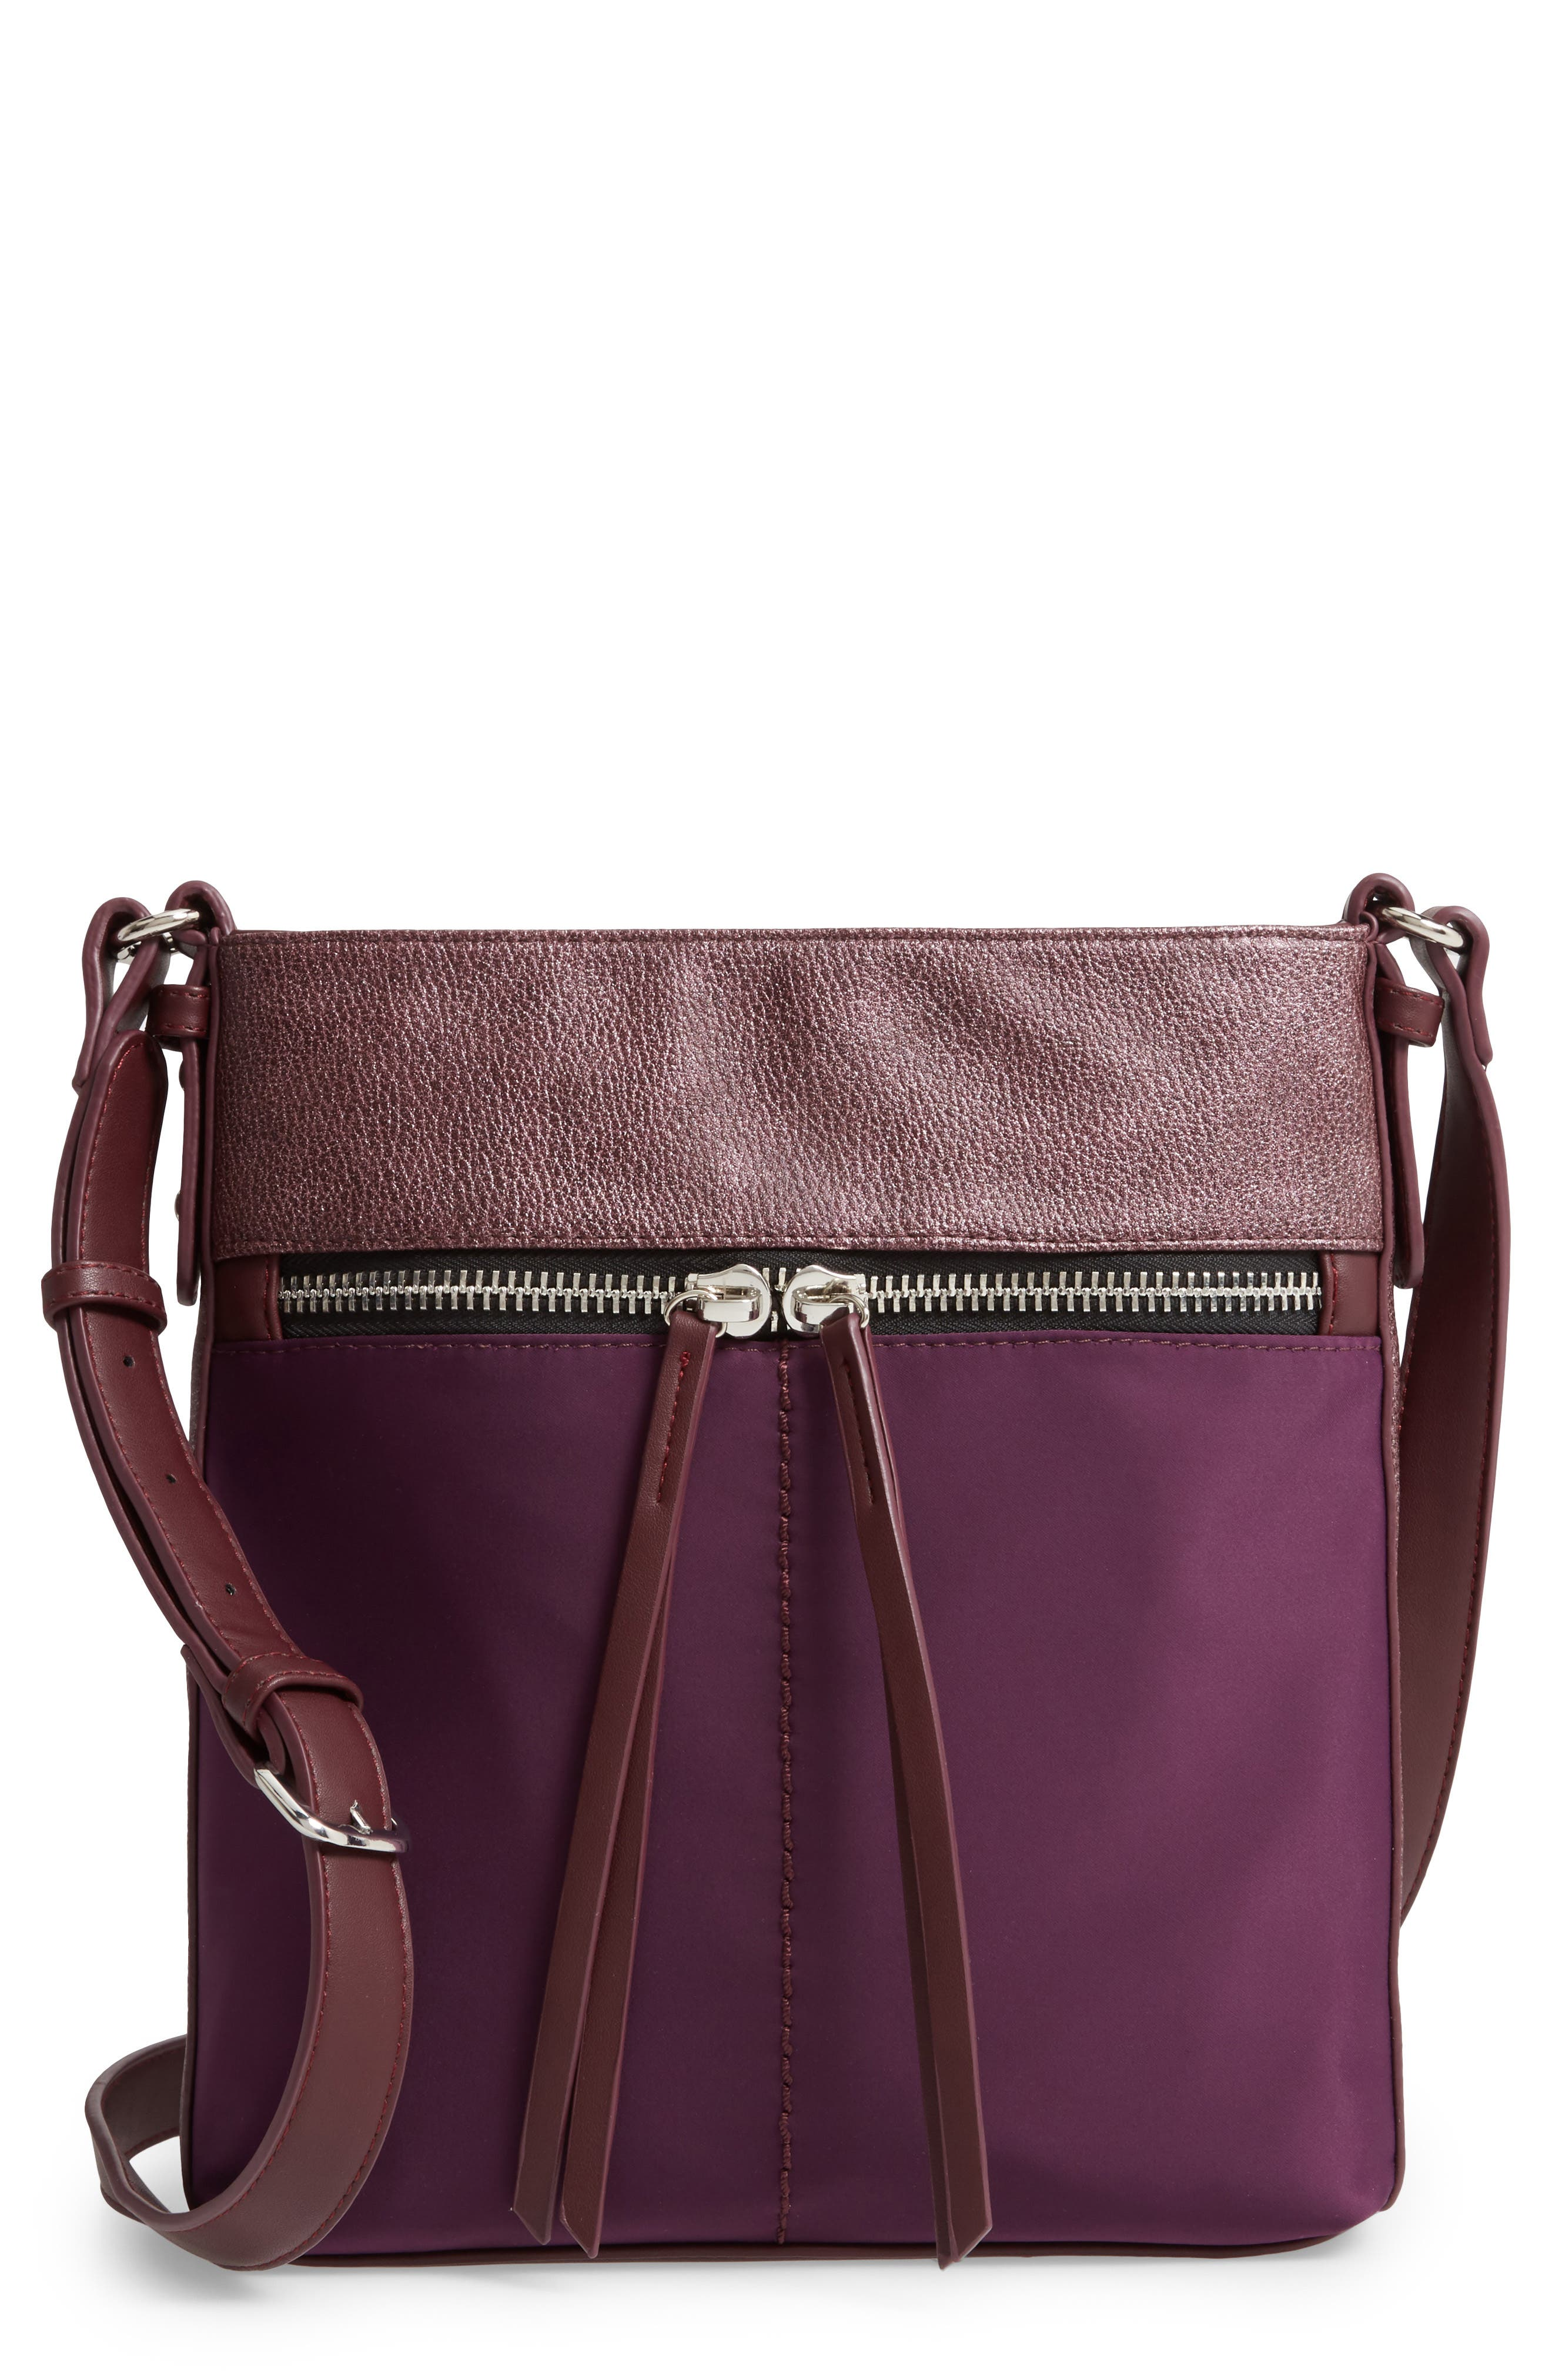 SONDRA ROBERTS Colorblock Faux Leather Crossbody Bag - Purple